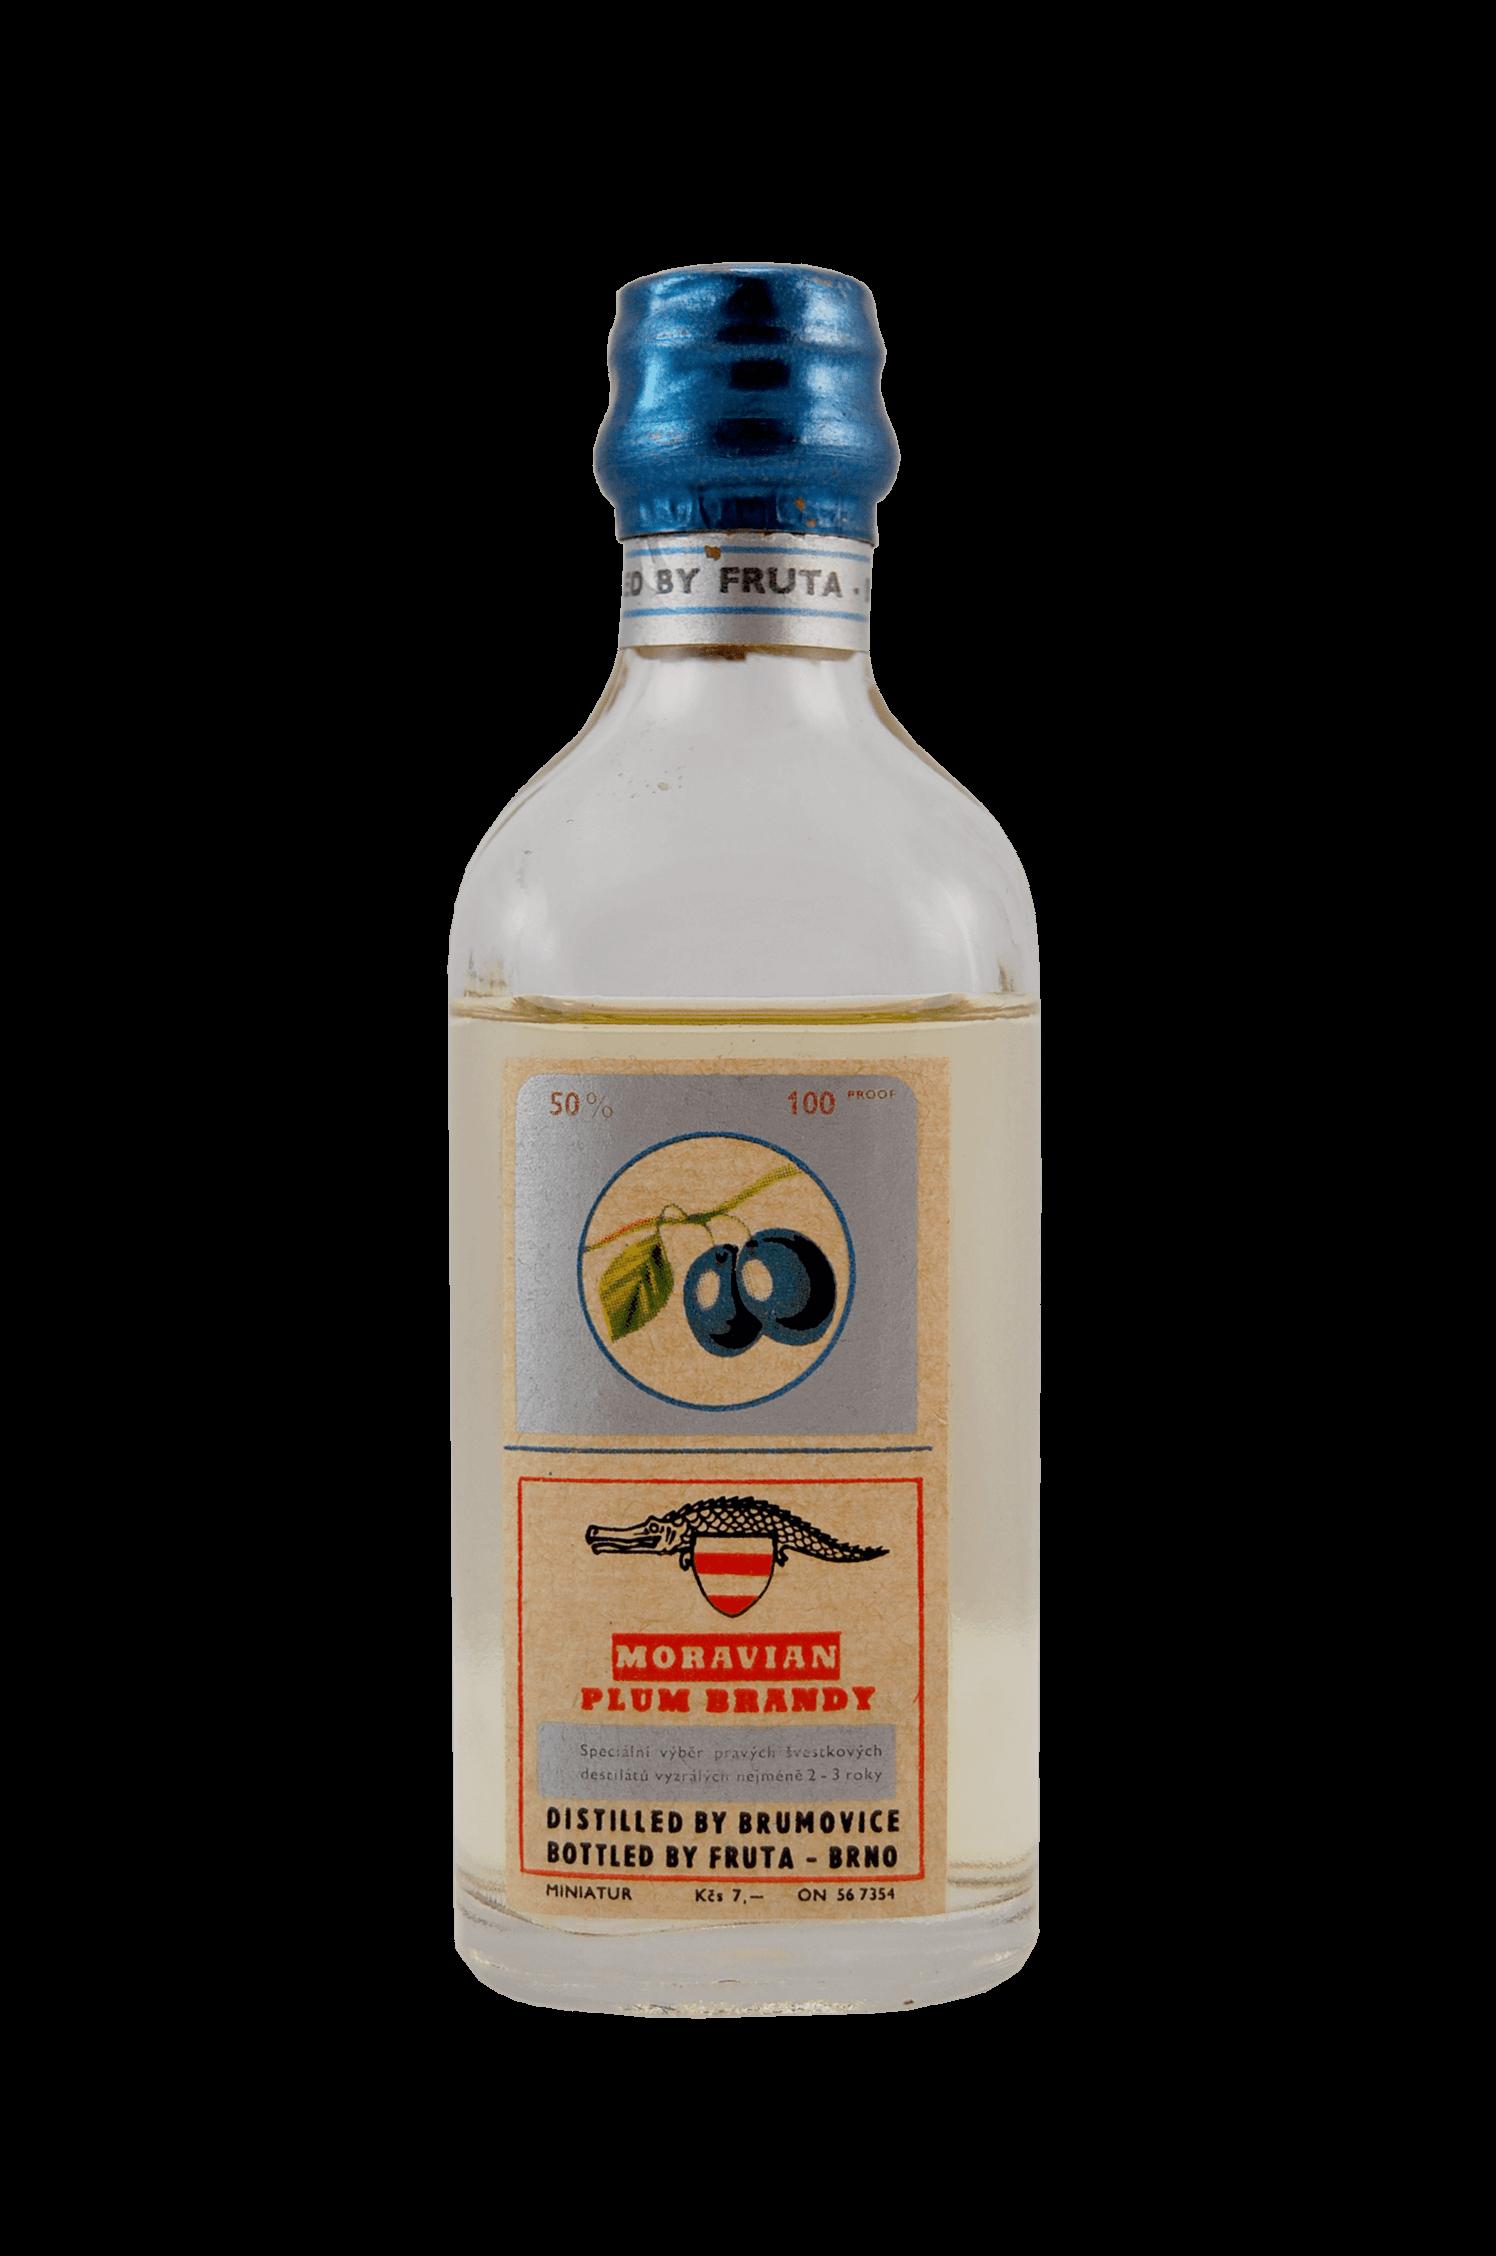 Moravian Plum Brandy